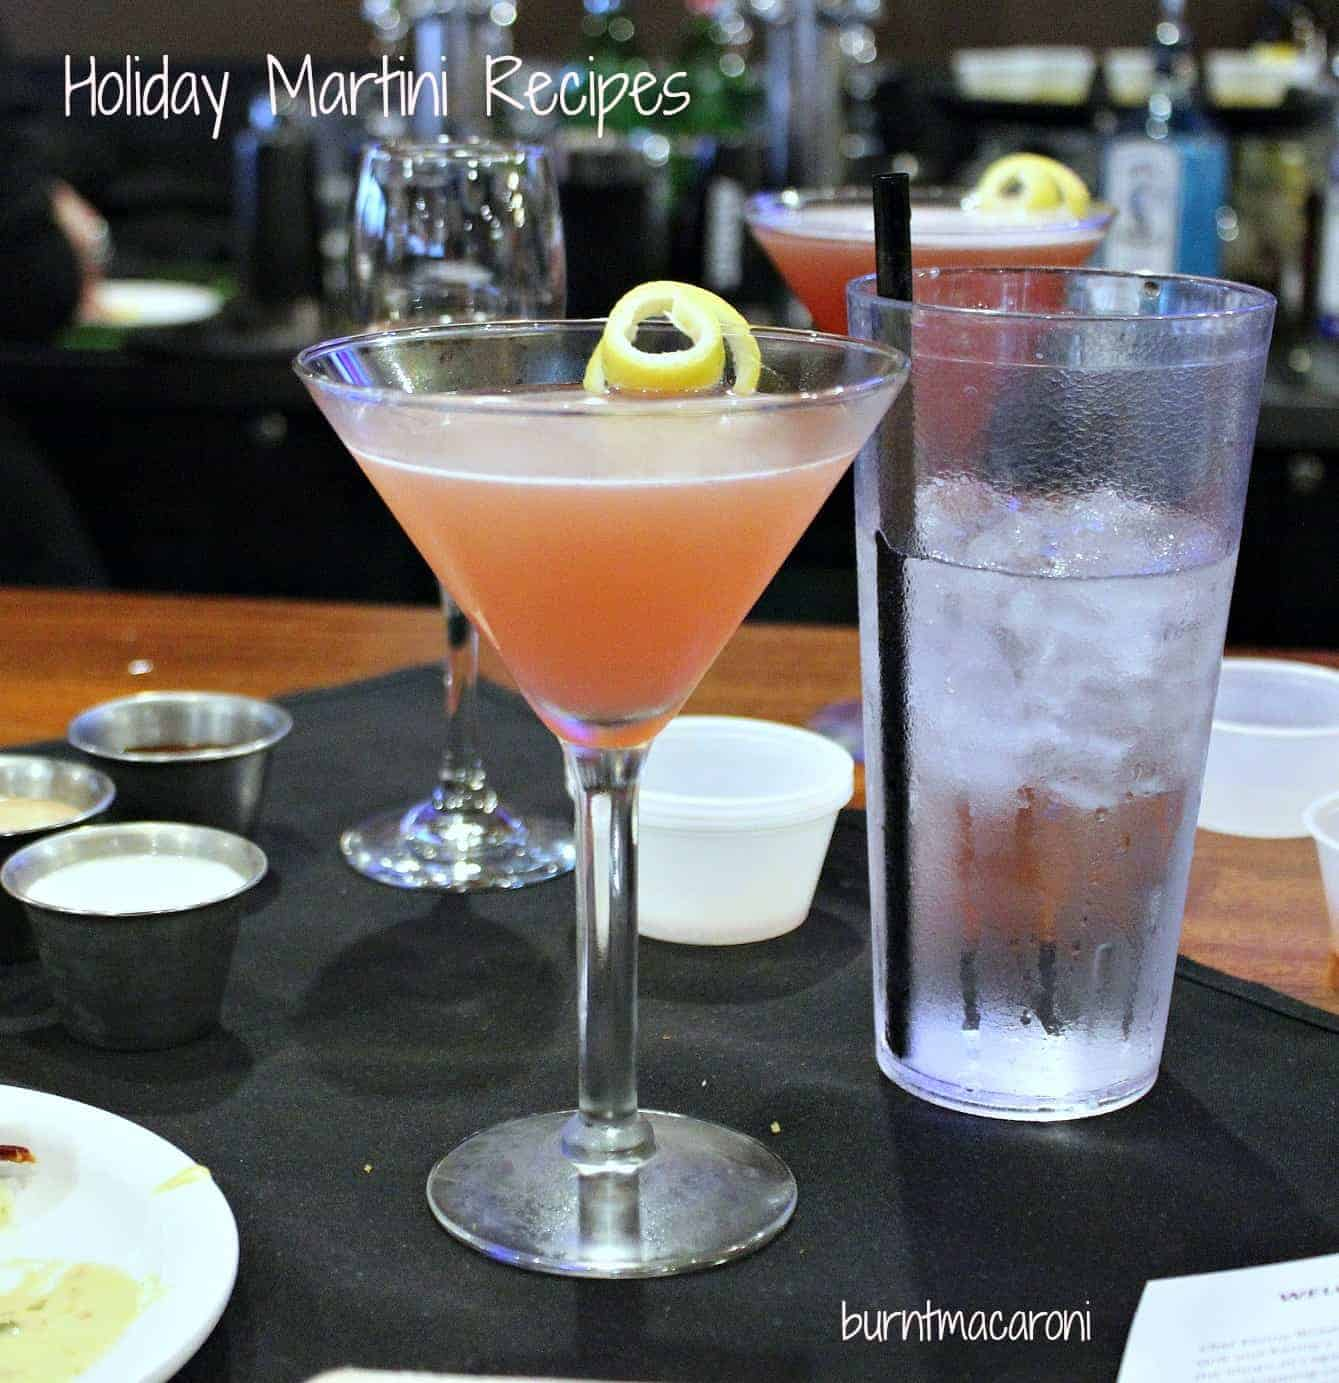 Deck the Halls Holiday Martini Ideas!